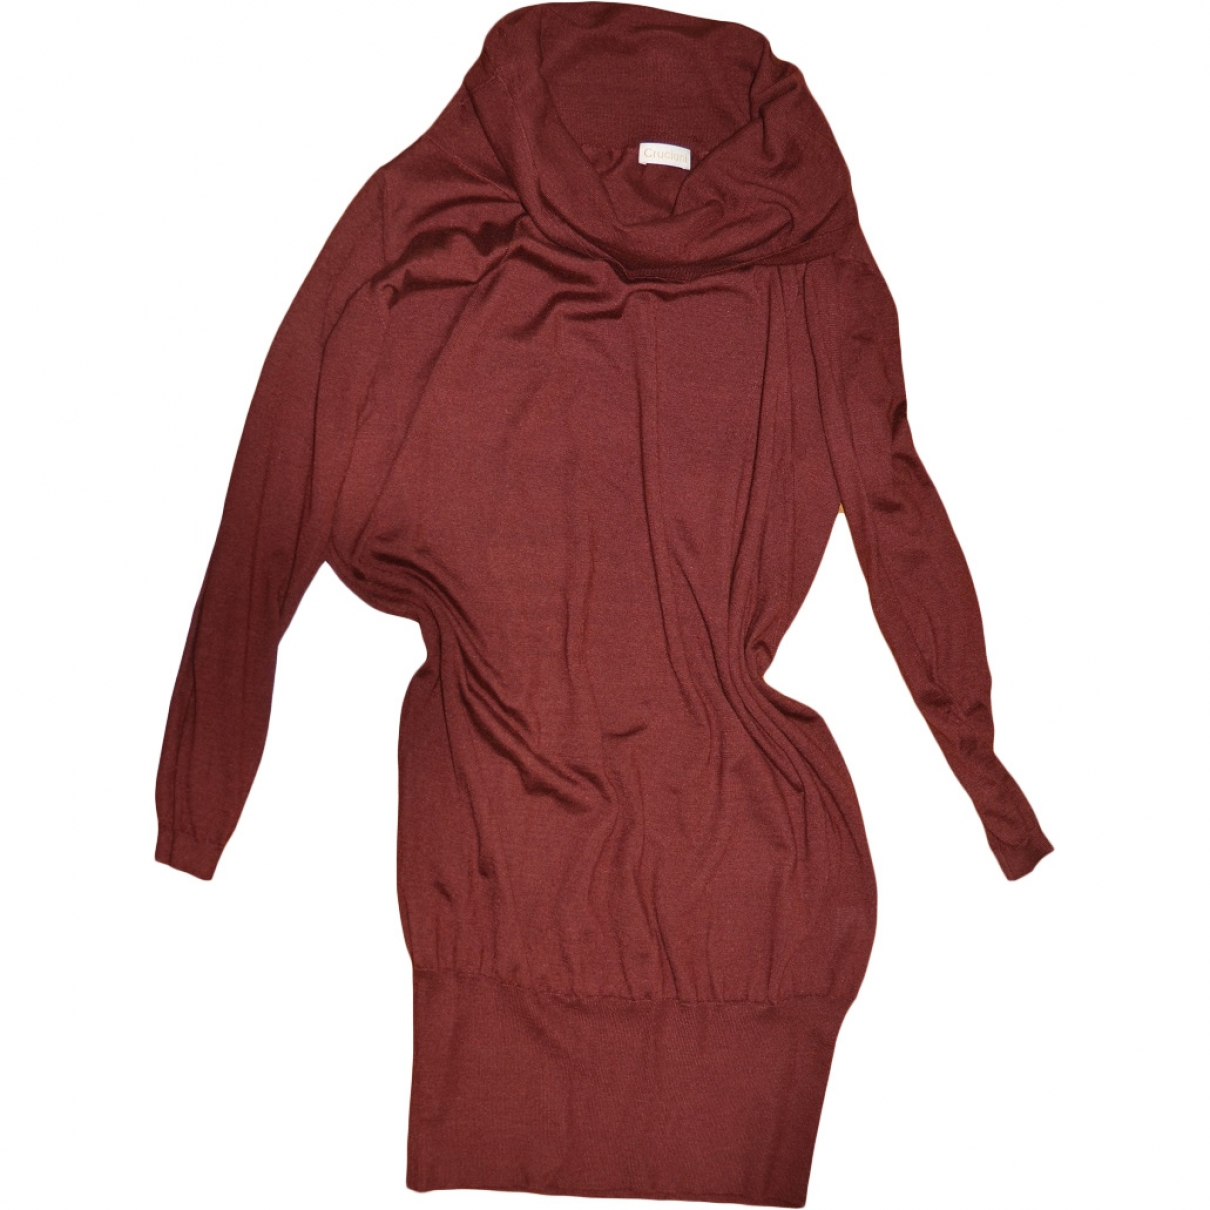 Cruciani \N Burgundy Cashmere dress for Women M International